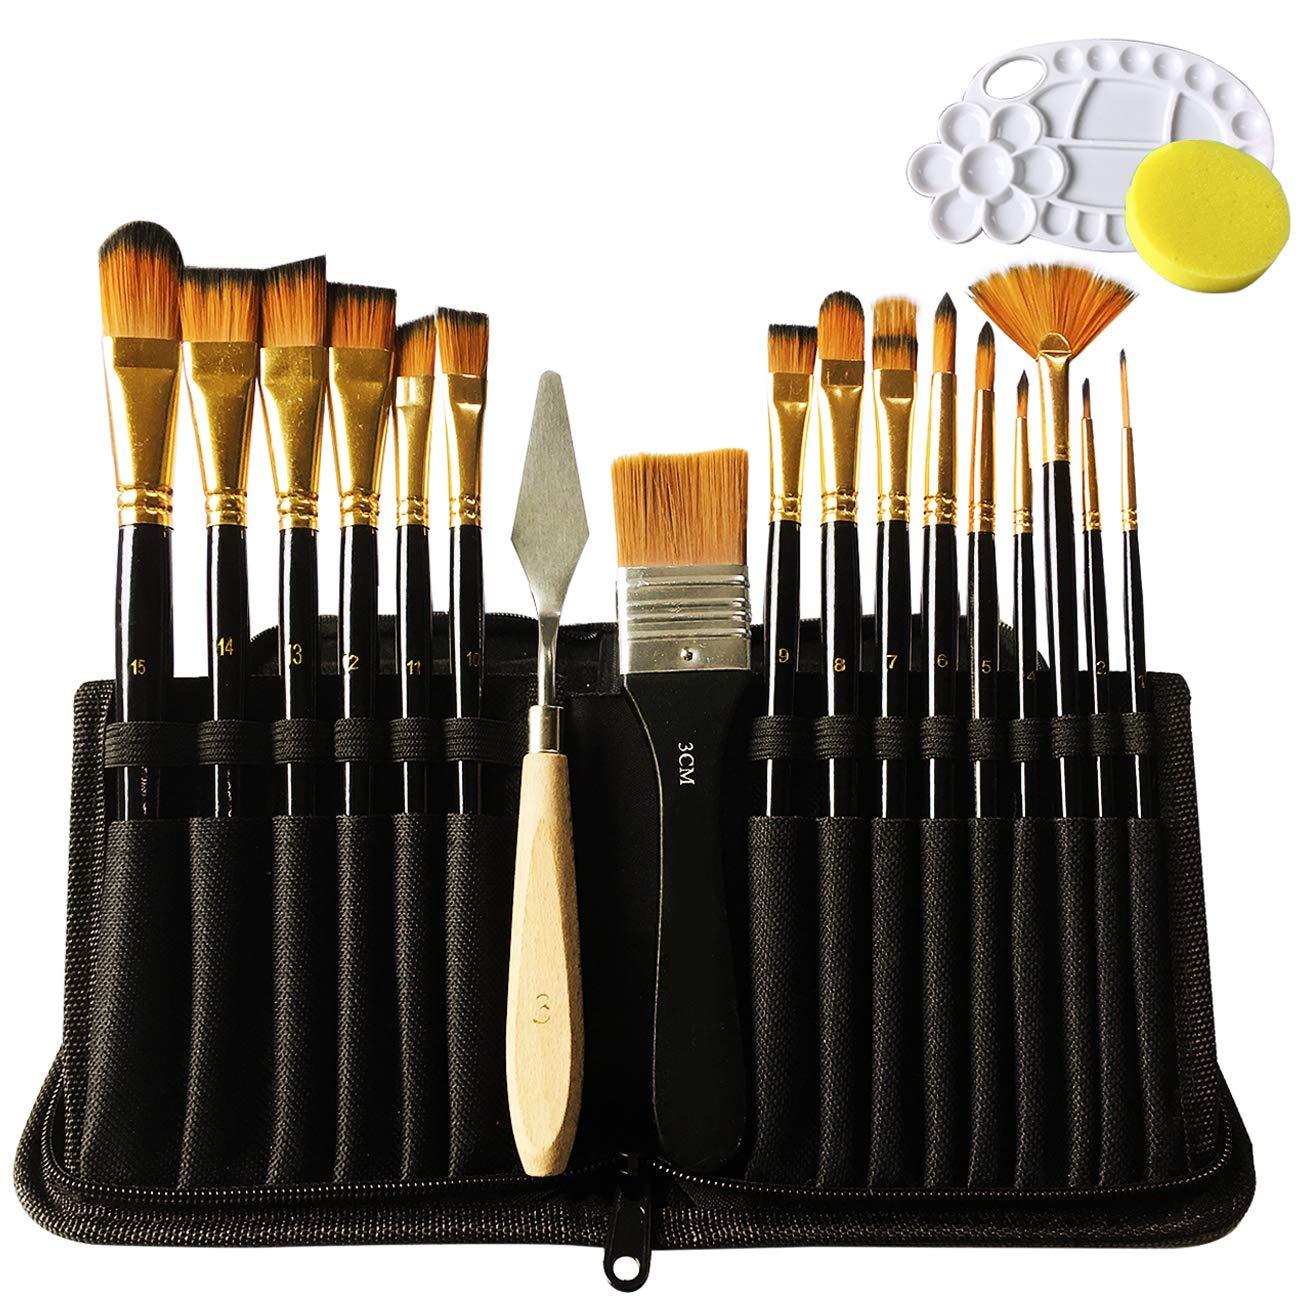 Lasten 19 Pcs Paint Brush Set, Professional Paint Brushes Nylon Hair Artist Acrylic Brush for Watercolor Oil Acrylic Gouache Painting(19 pcs/set)